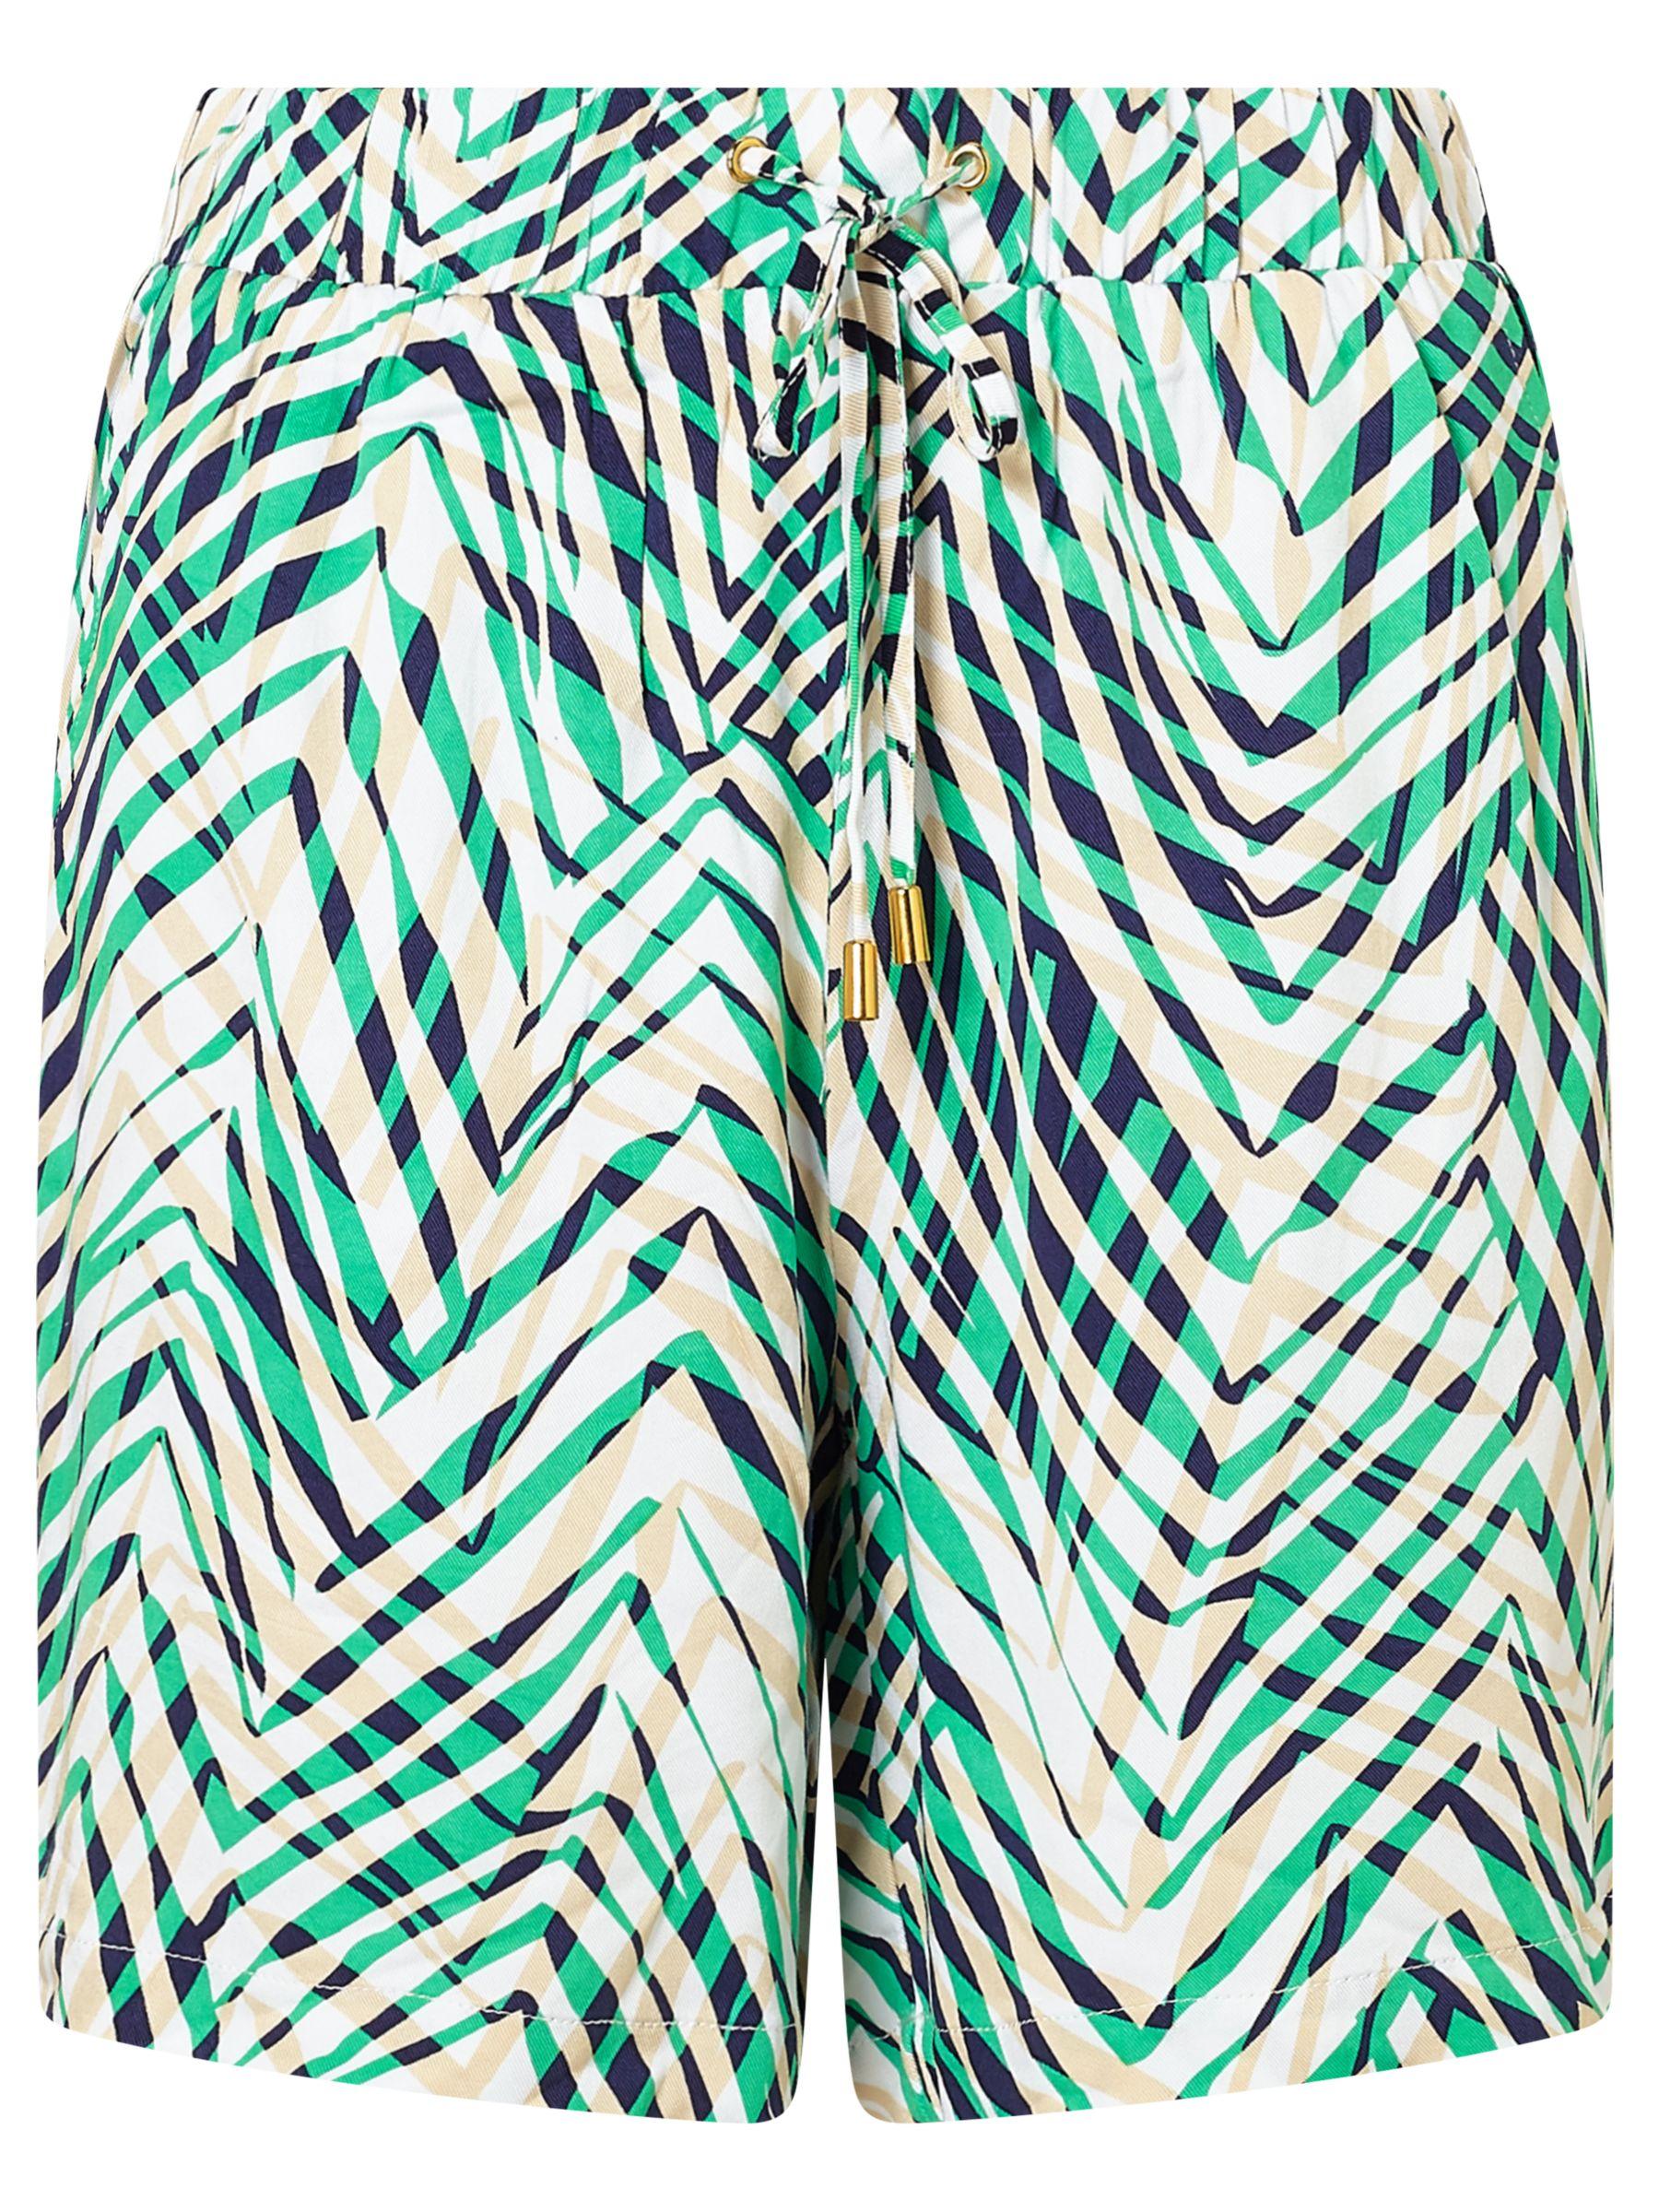 Minimum Minimum Marjanne Shorts, Paris Green